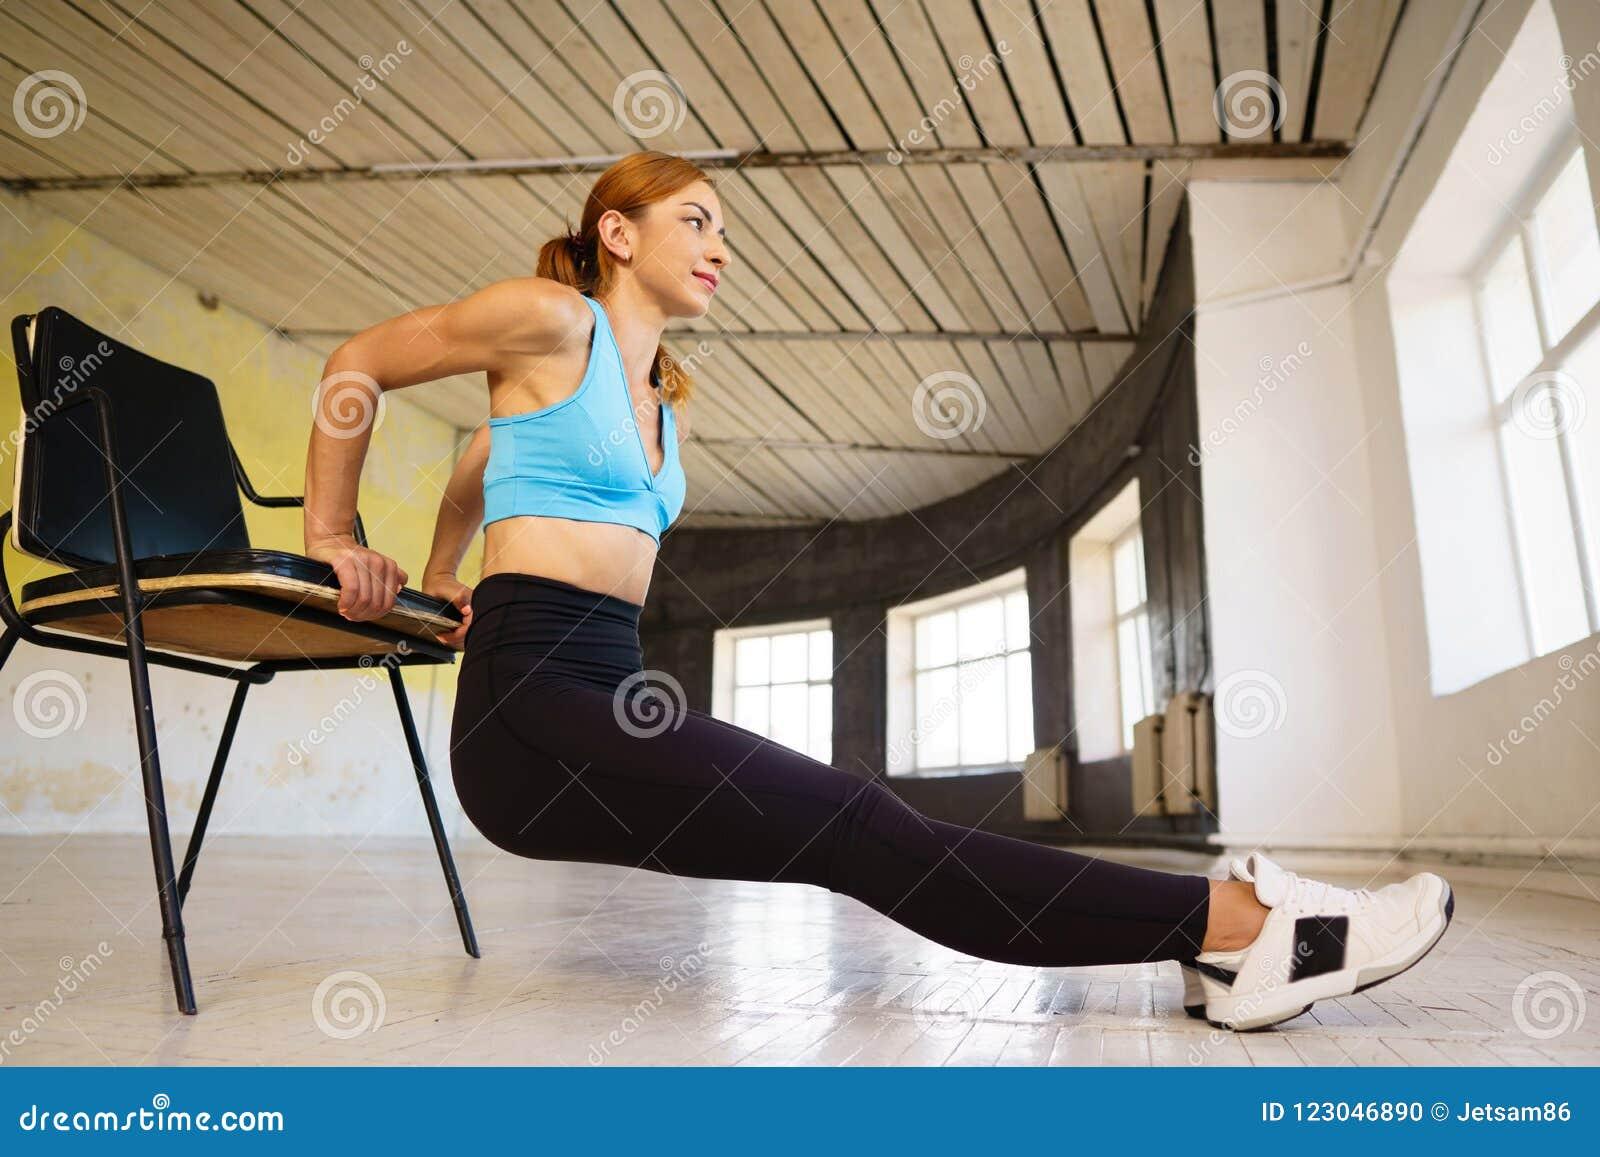 Woman Doing Reverse Push Ups Using Chair Stock Photo - Image